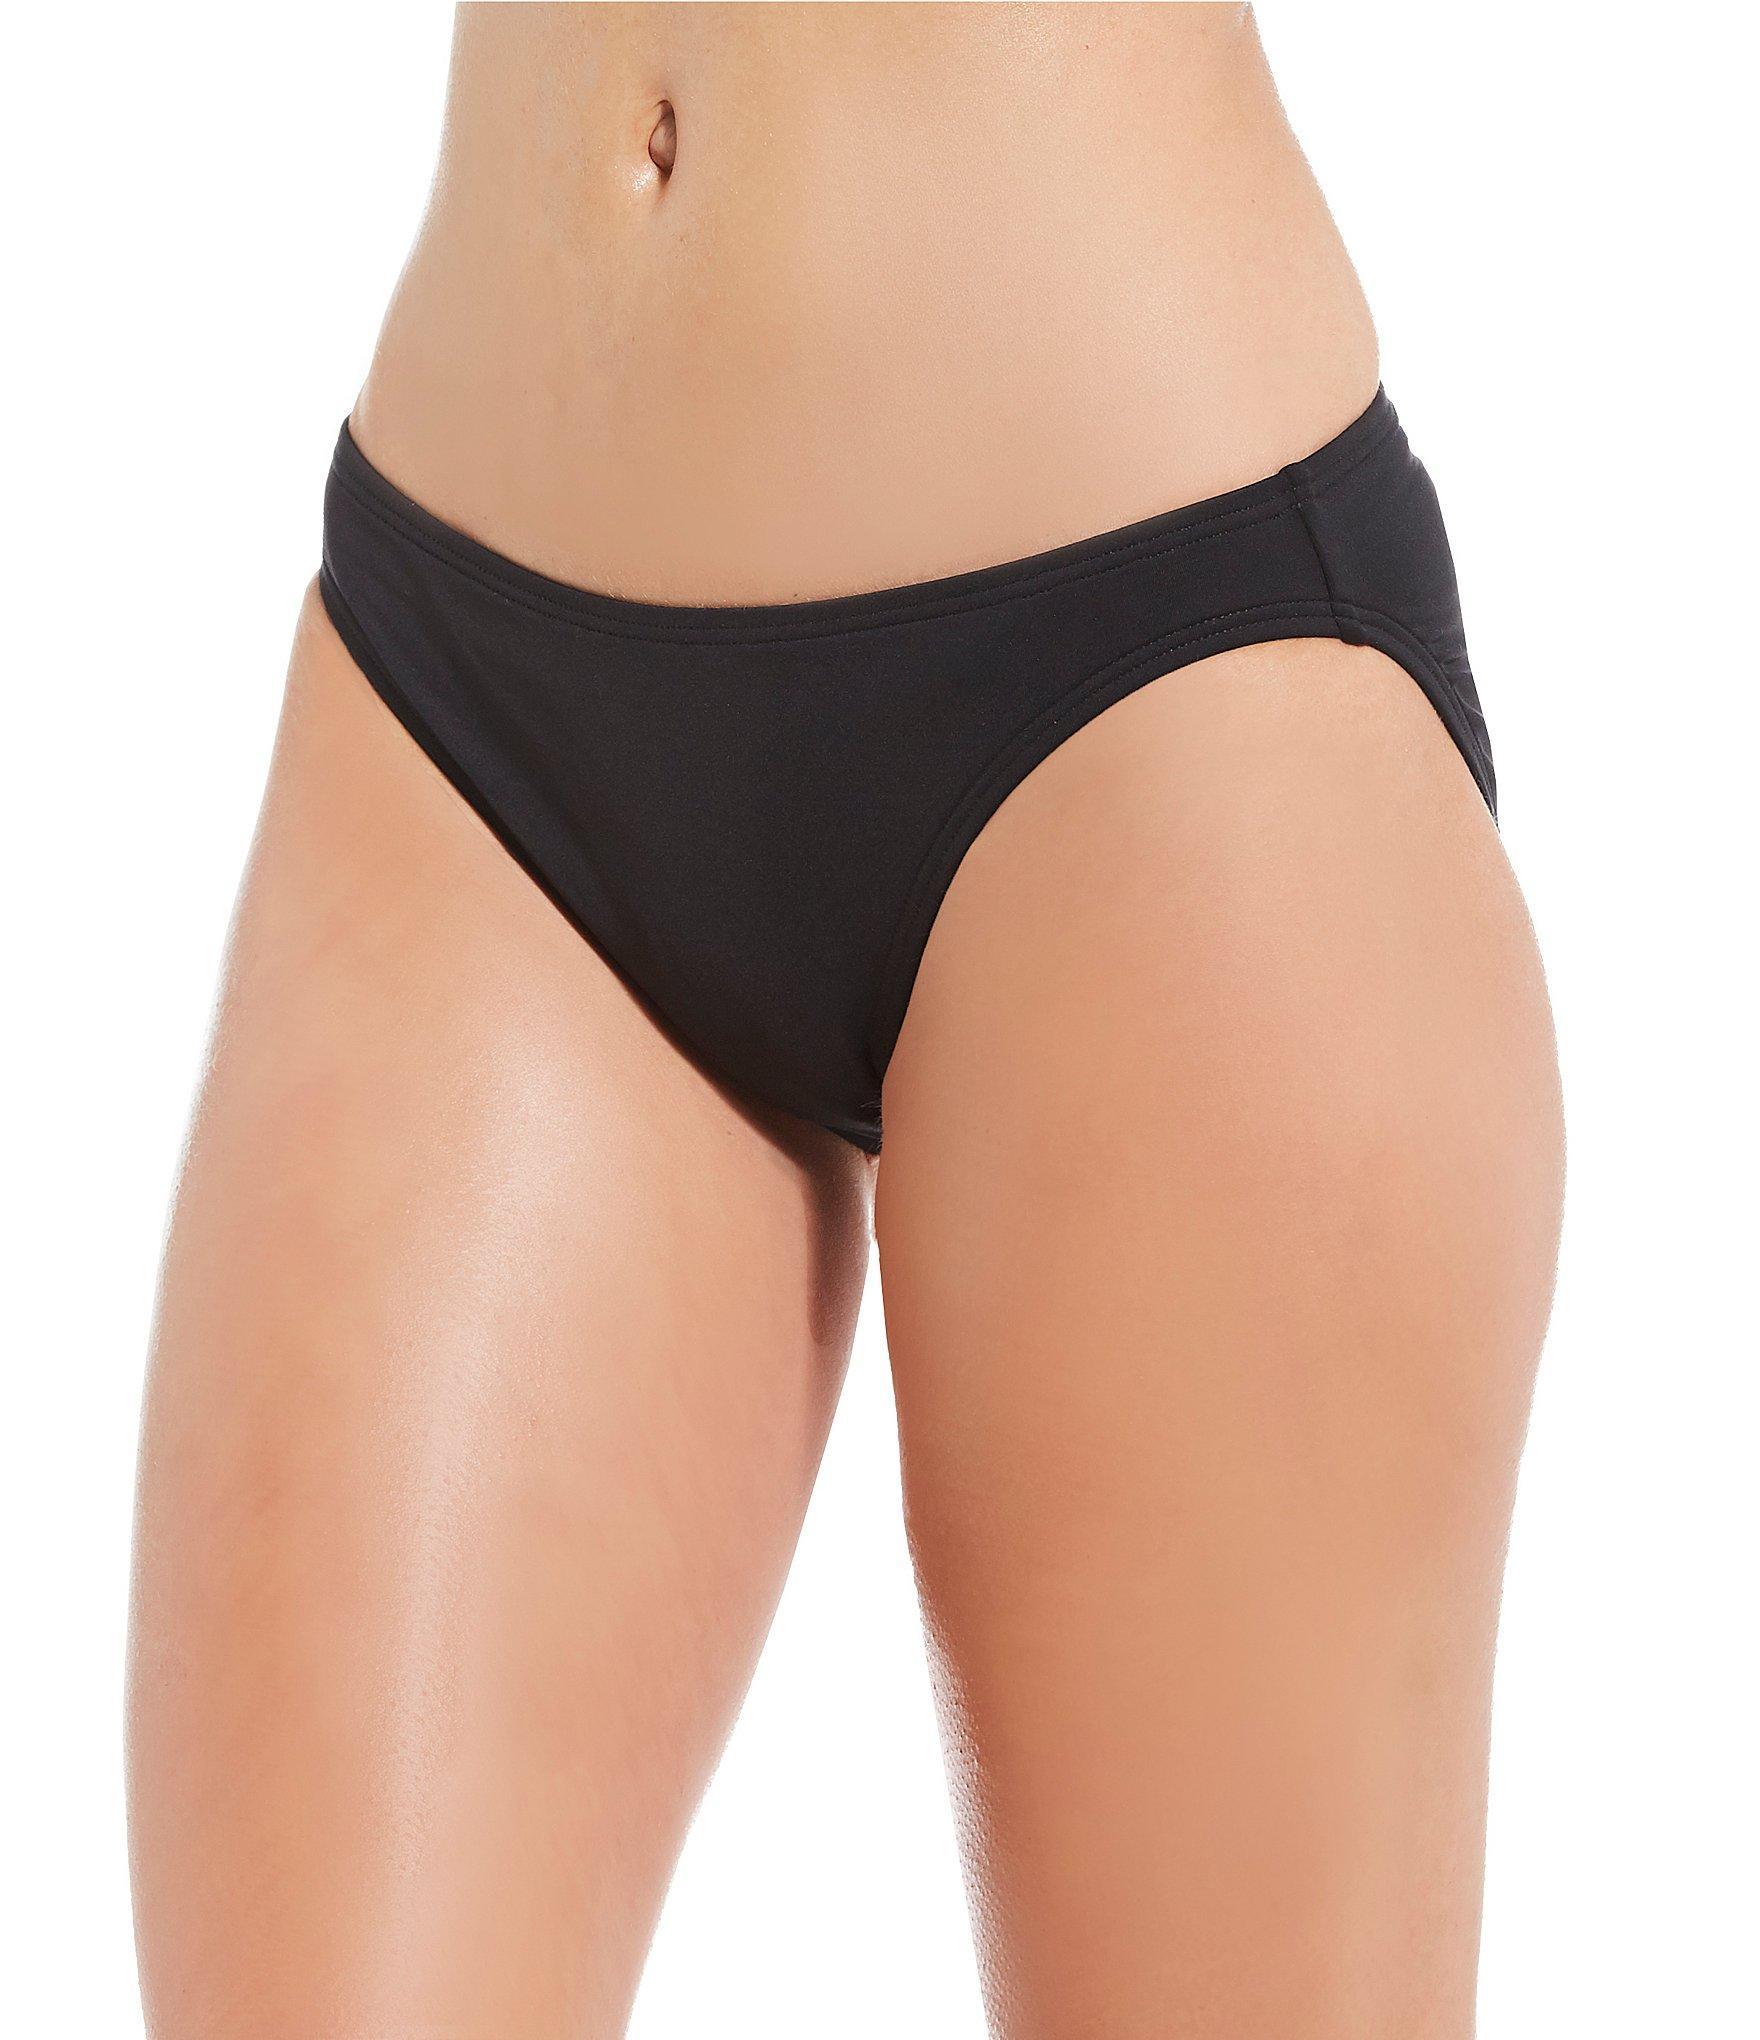 c3ffb84fddceb Lyst - MICHAEL Michael Kors Classic Bikini Swimsuit Bottom in Black